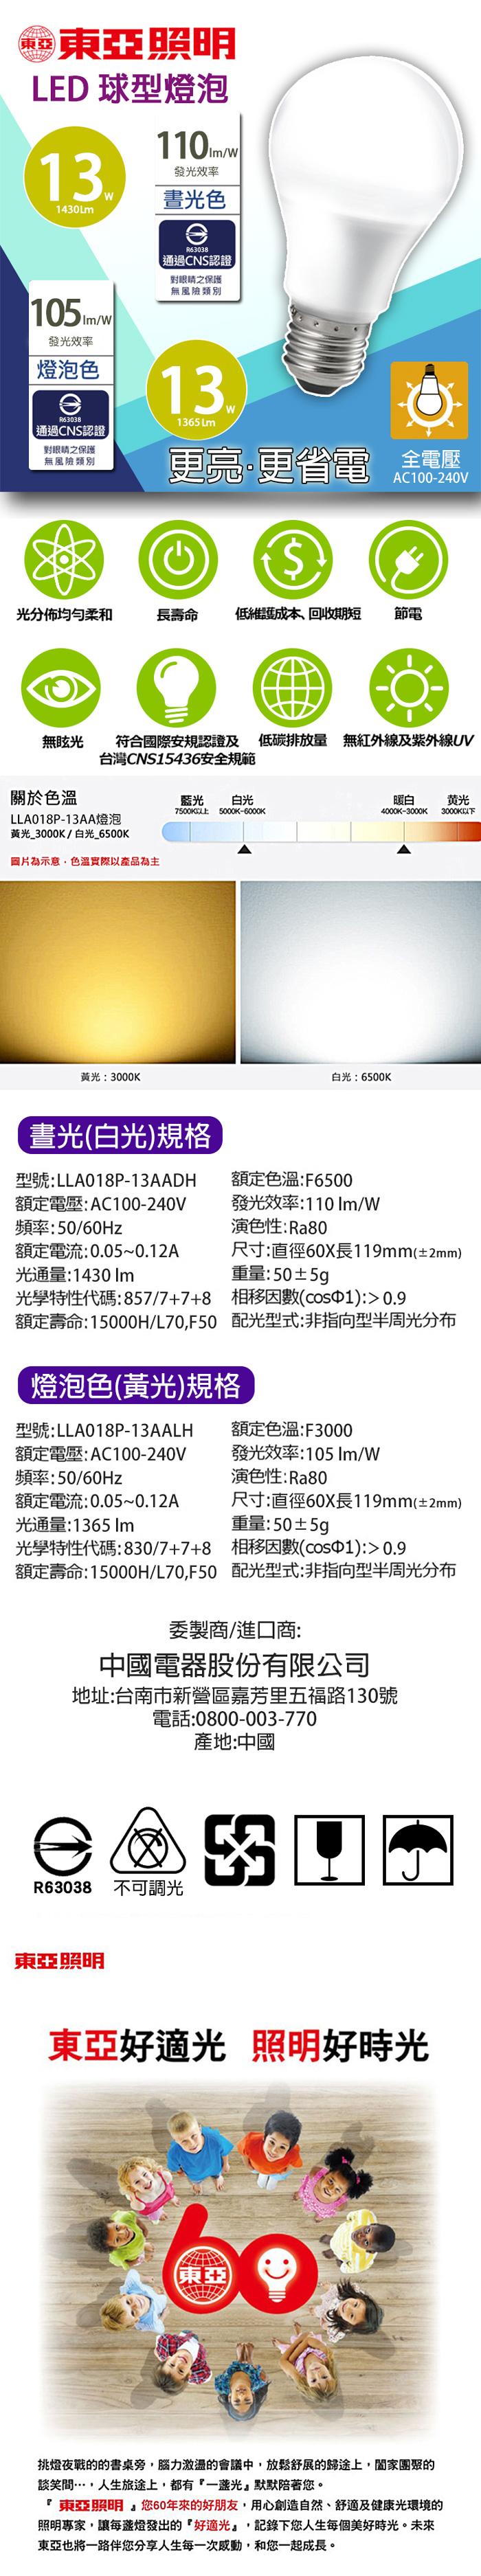 東亞13W-LED(白光)燈泡-1430LM (深藍)